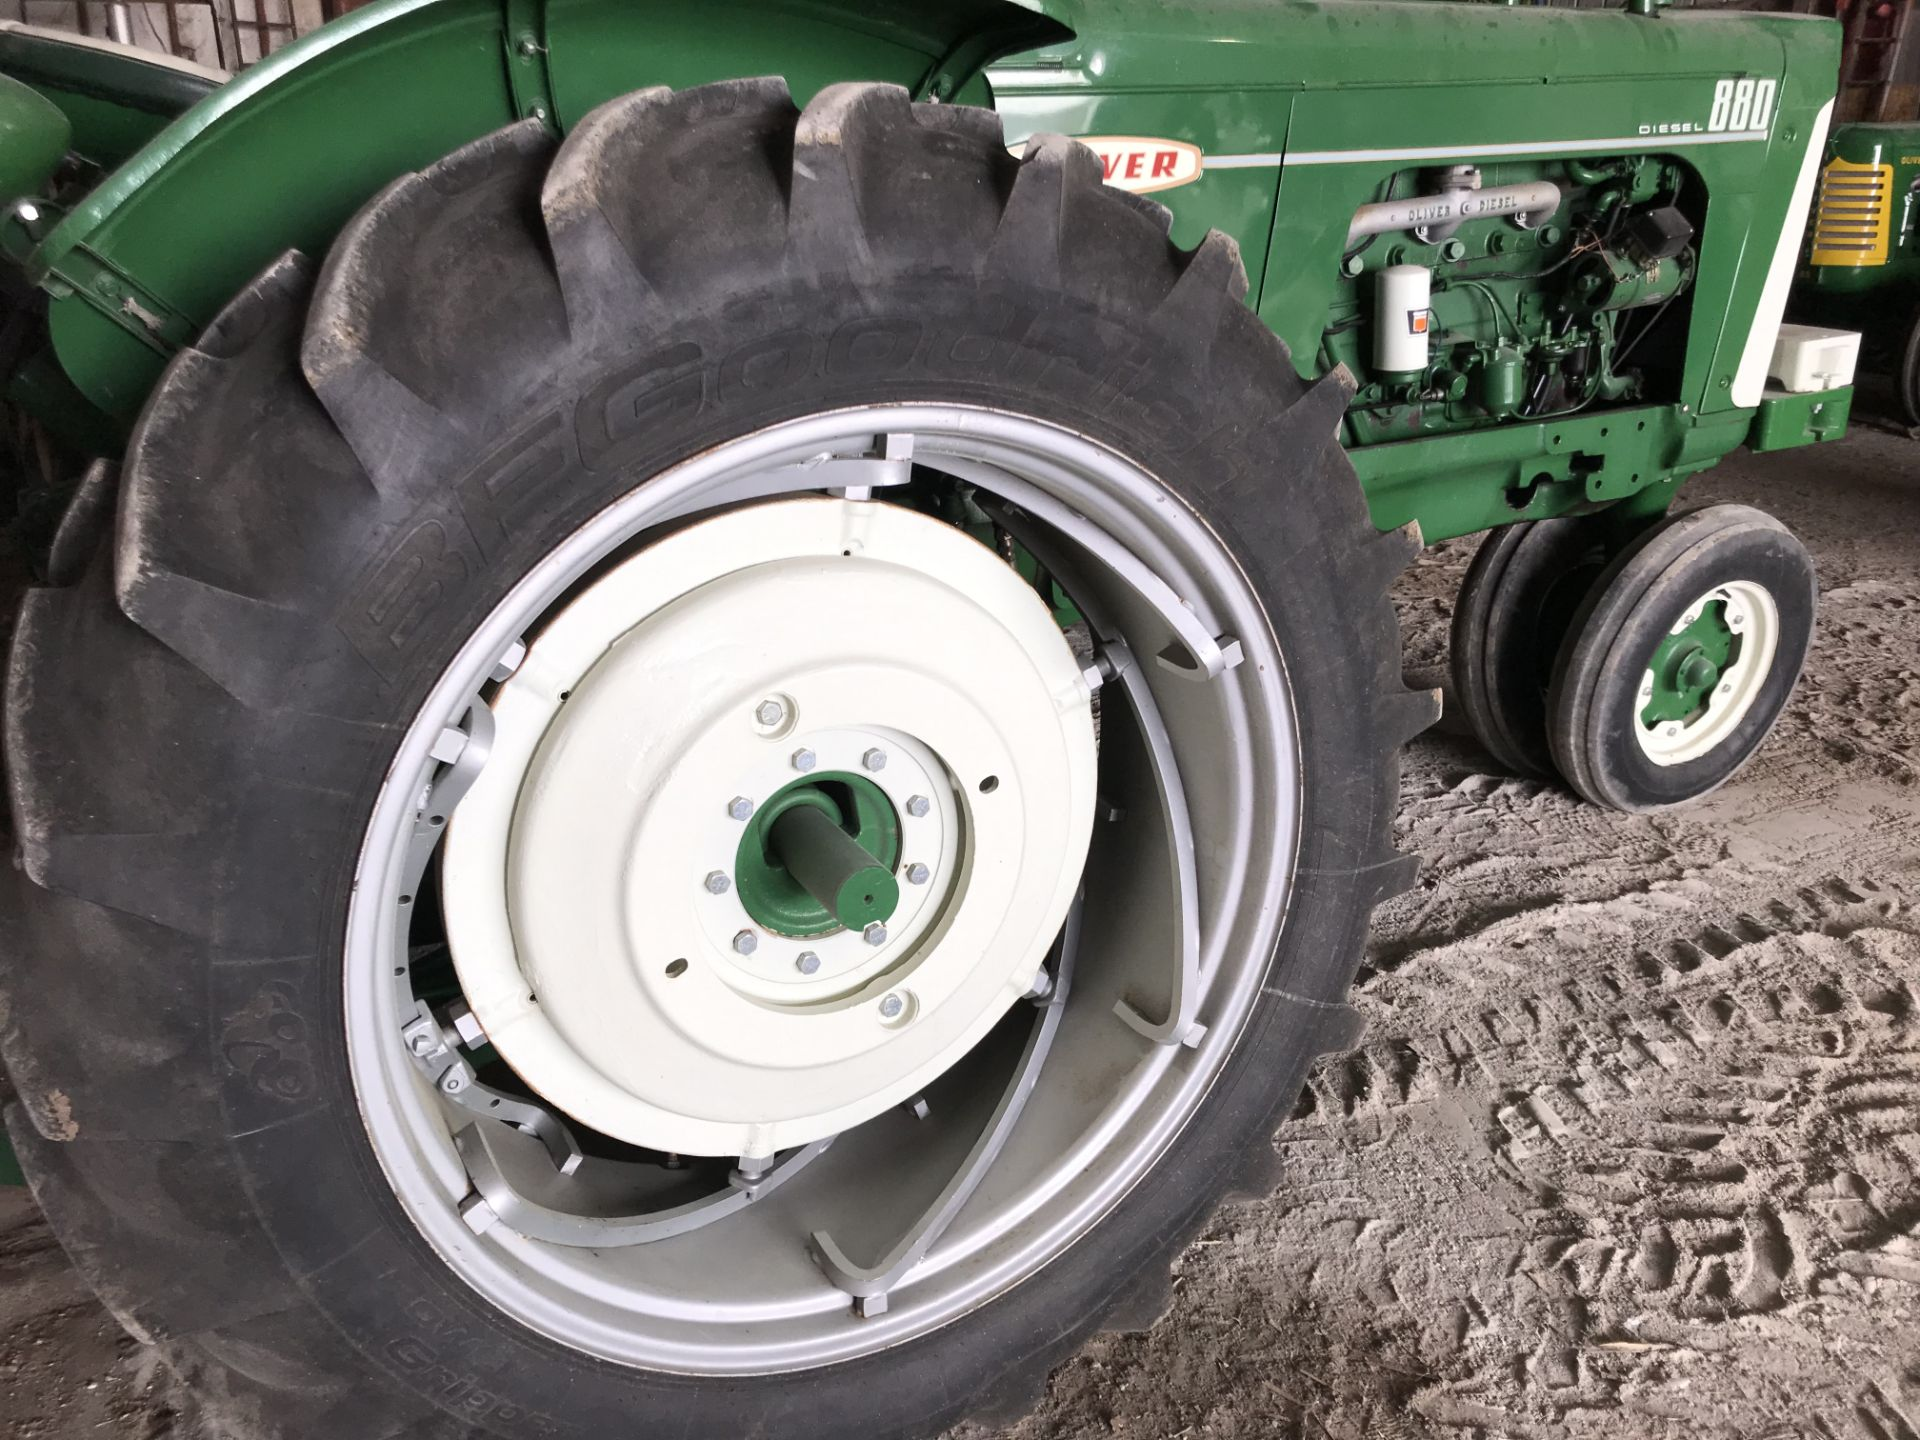 Lot 18 - Mdl.880 Diesel S#87-95-?? NF, Frt. Slab Wts, Dual Hyd, 15.5x38 New Rubber, Power Adjust Rims (